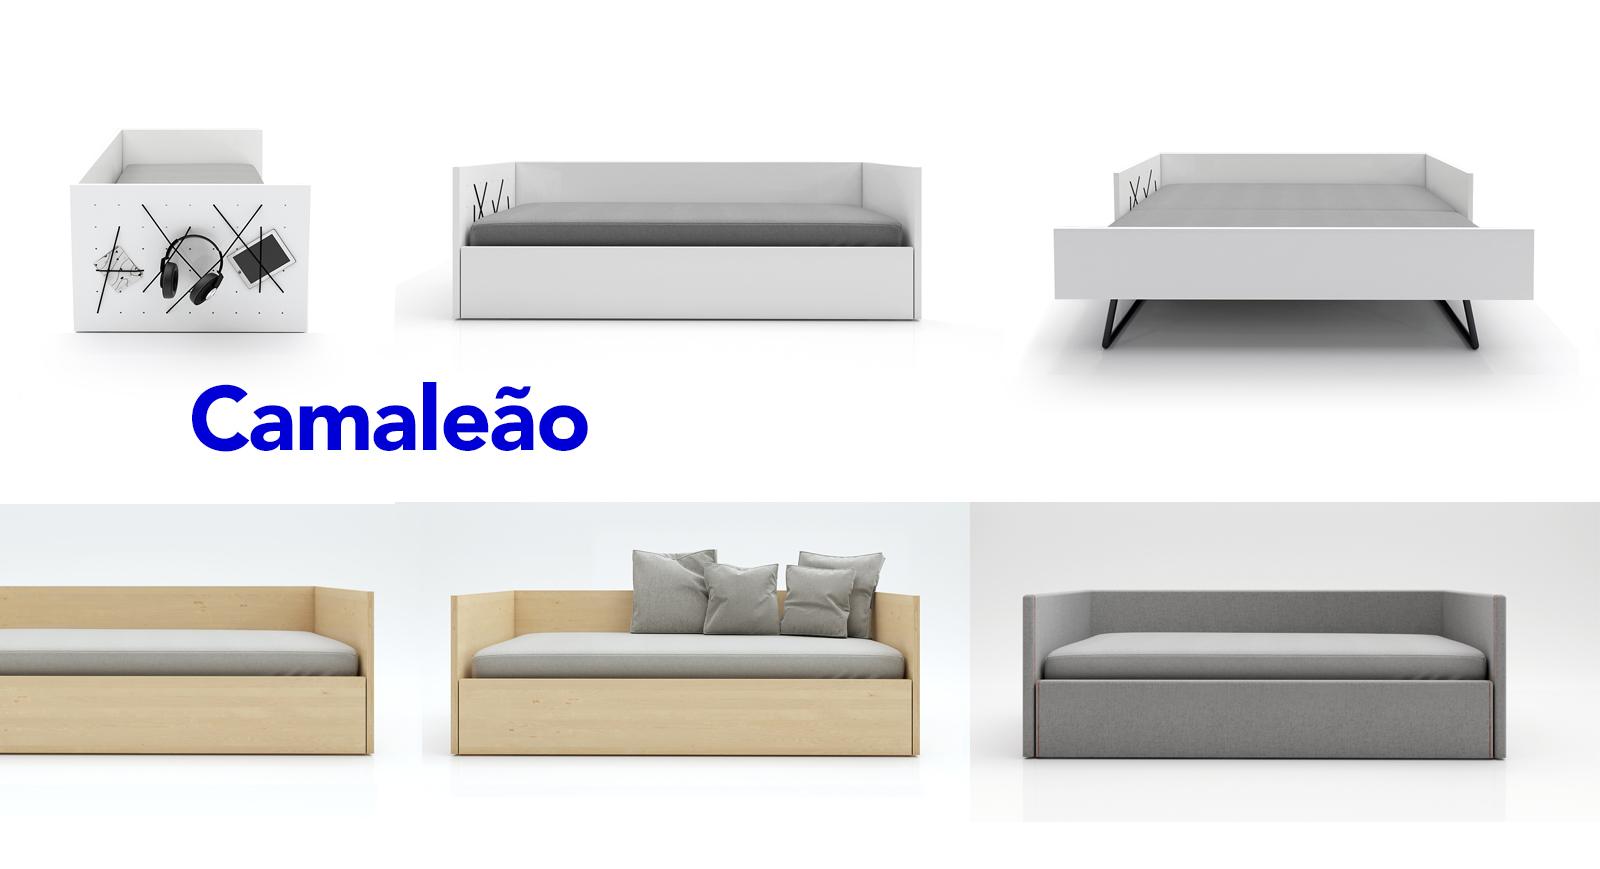 folding chair lulu bath lift boa safra eco home design